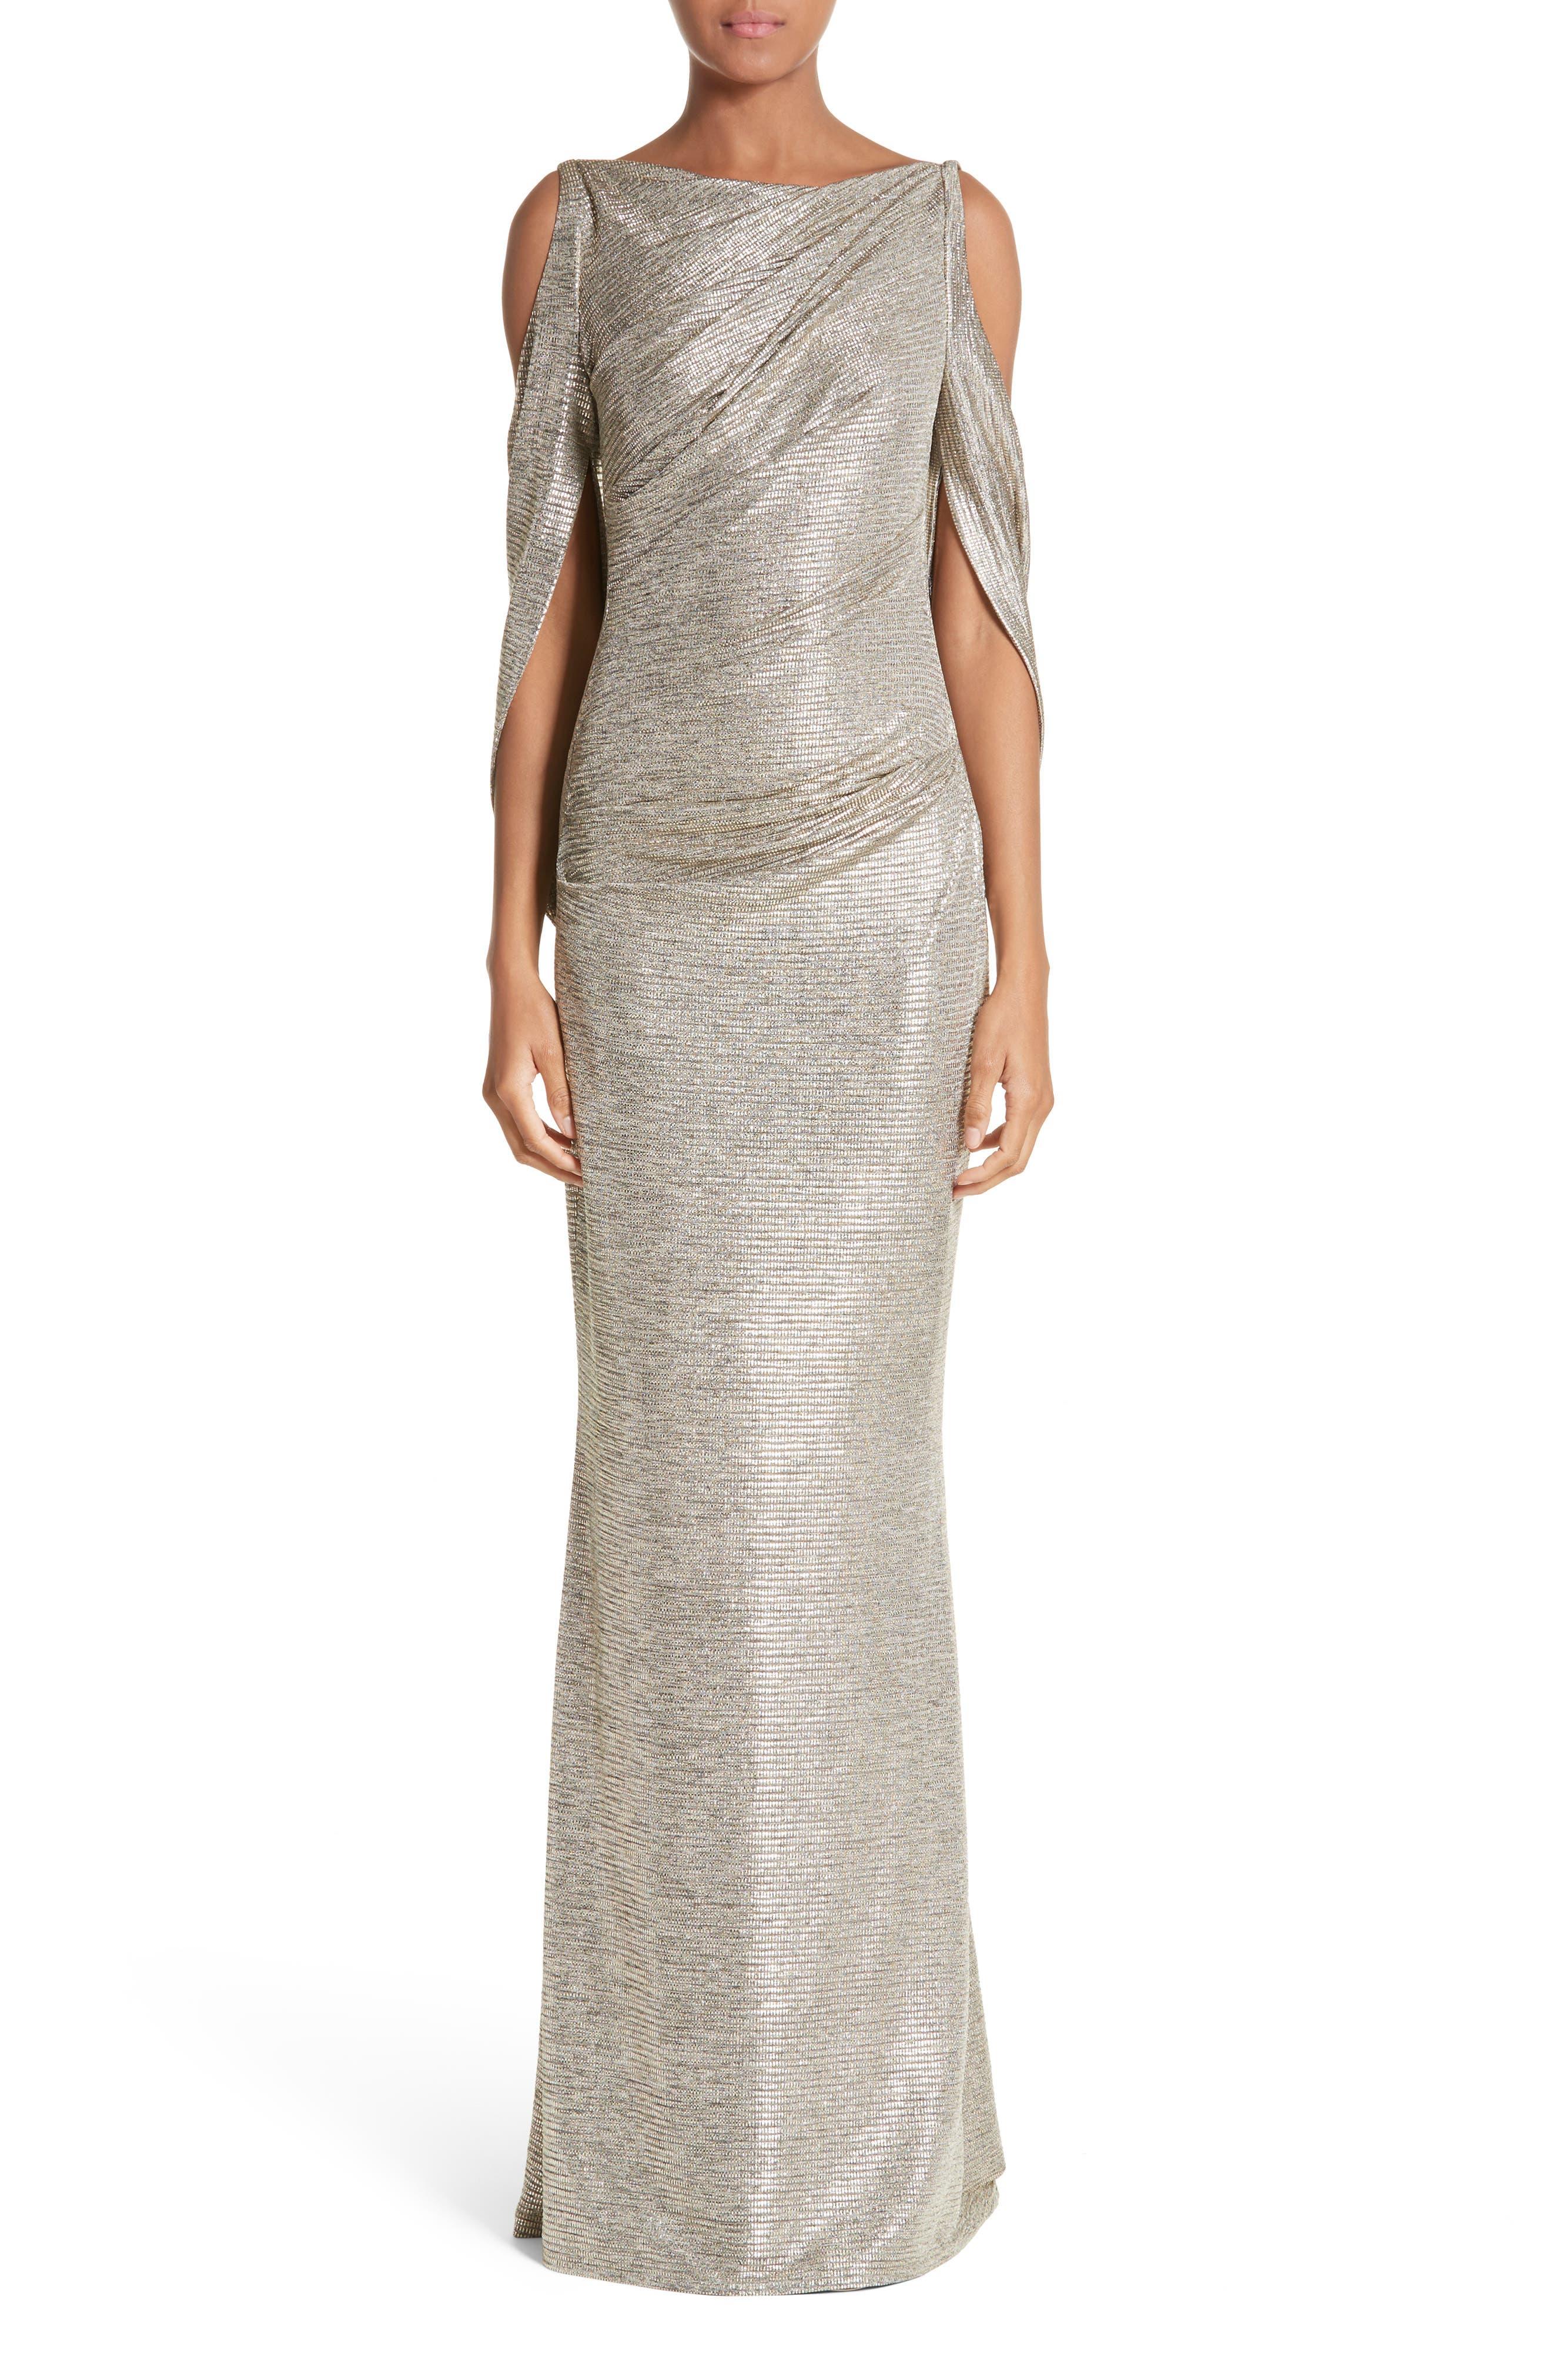 Main Image - Talbot Runhof Cold Shoulder Drape Back Gown